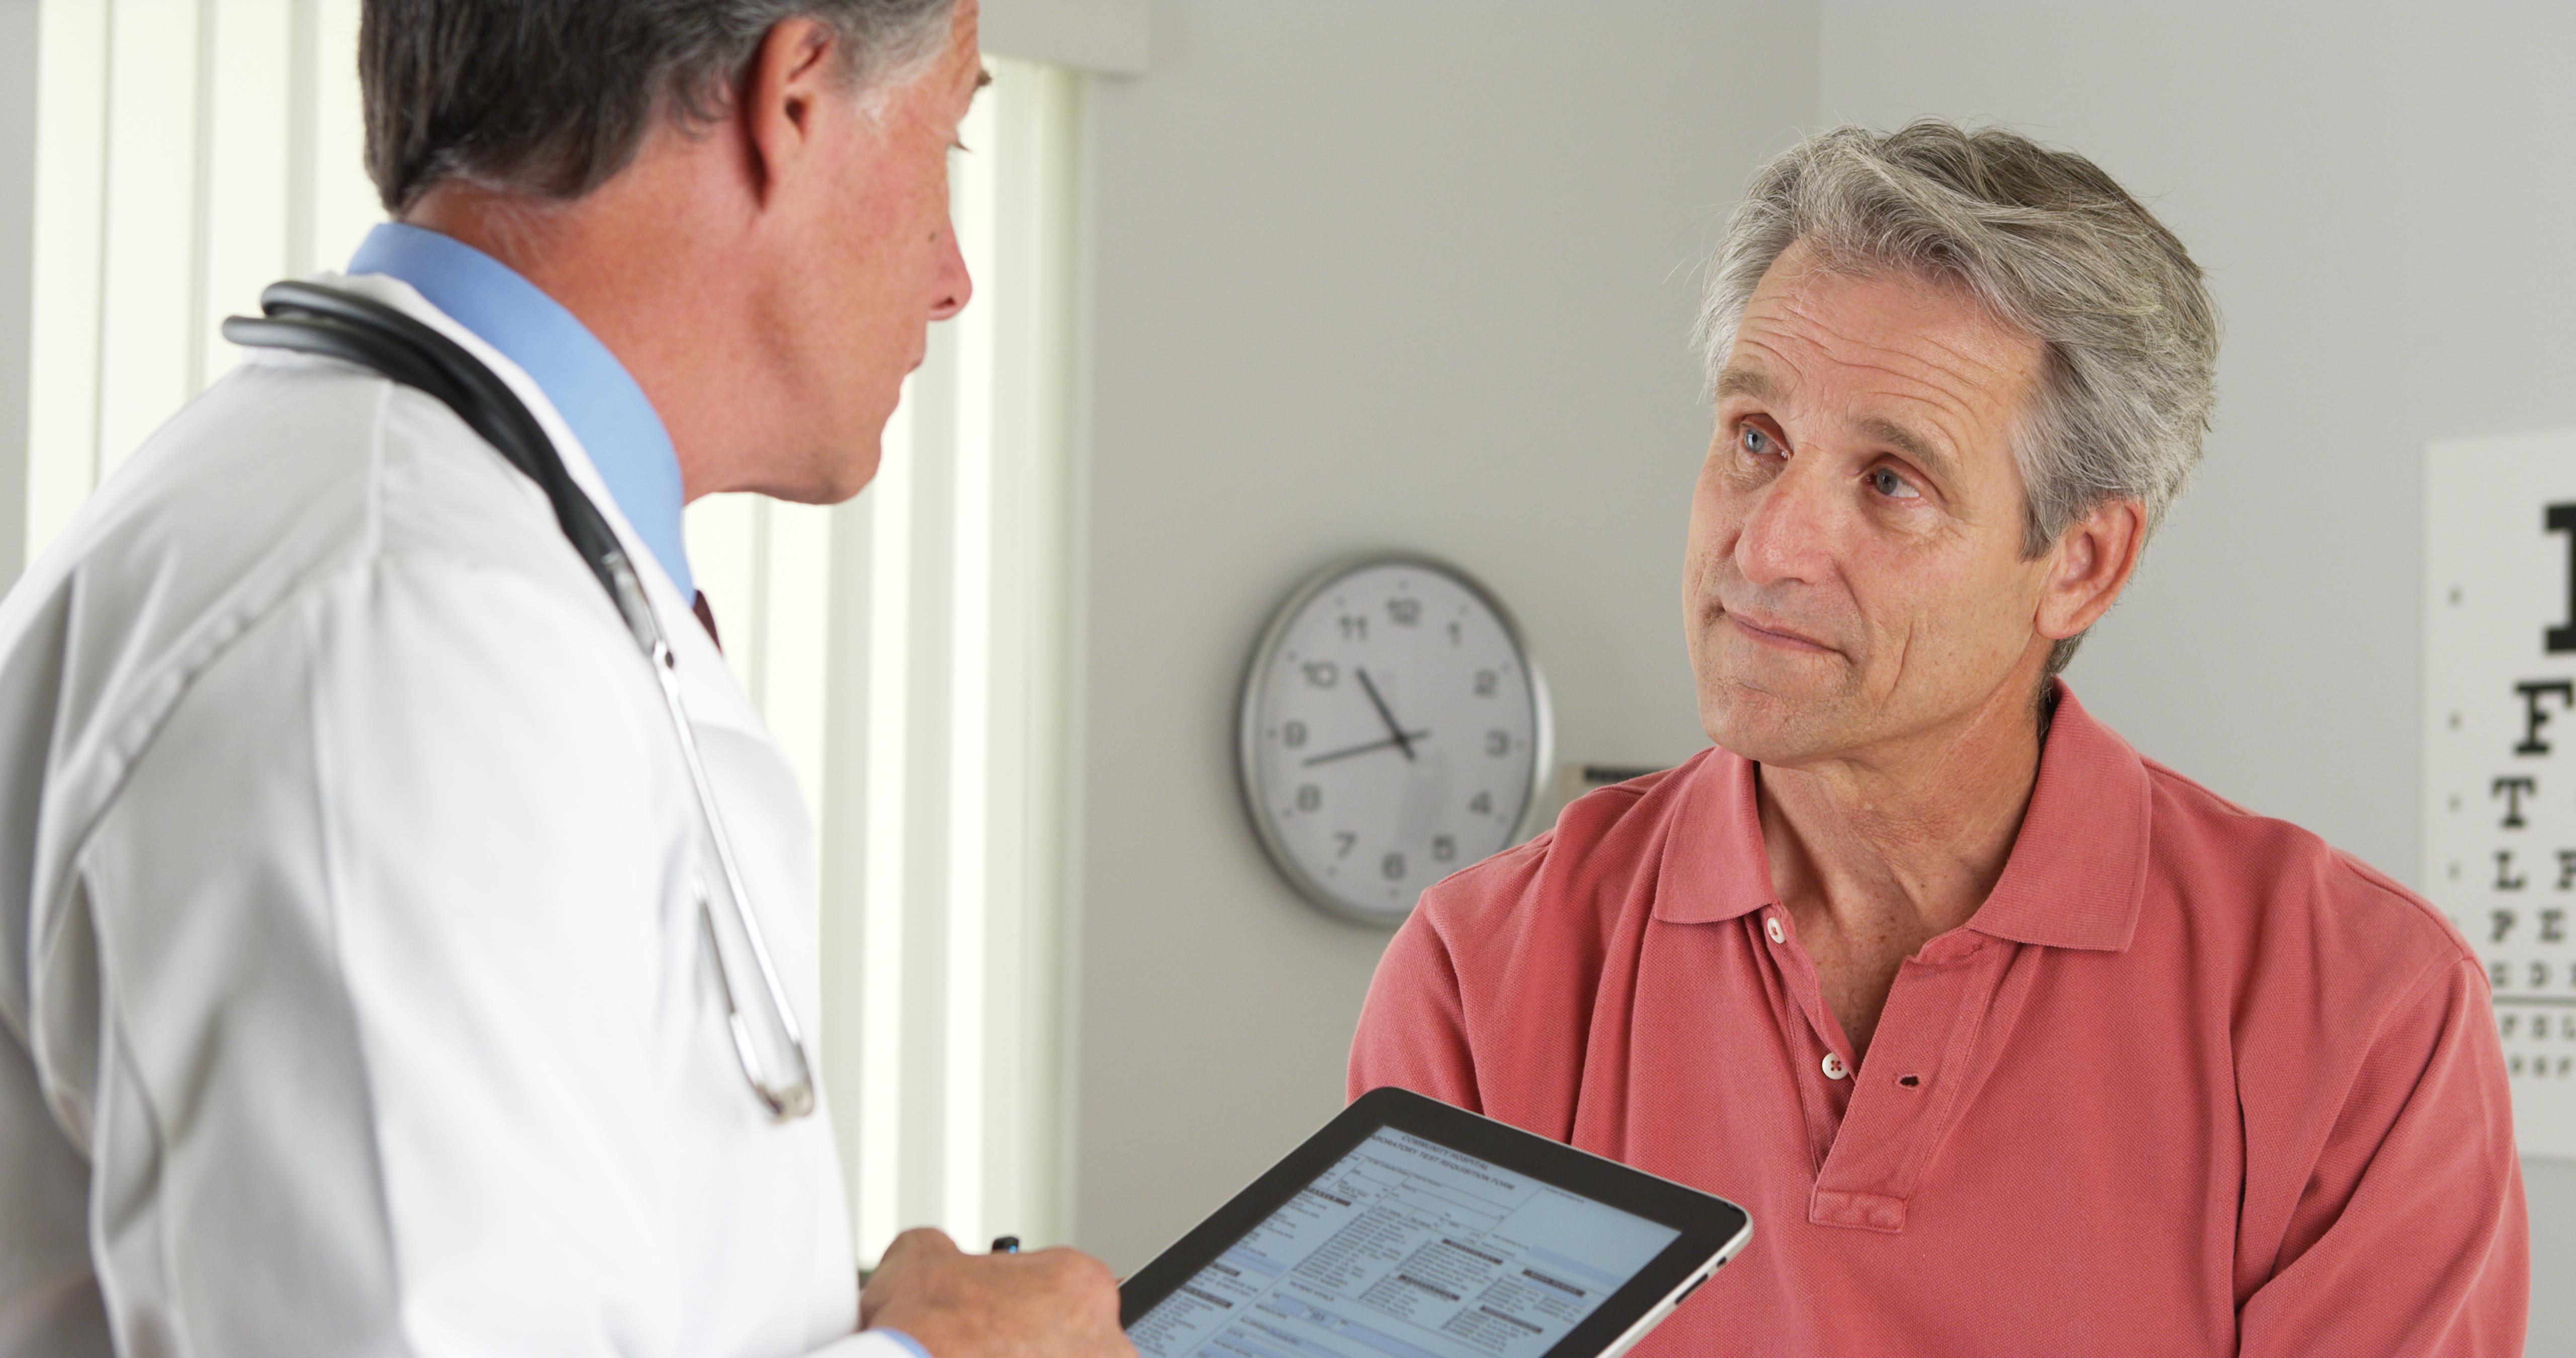 Epharmix: Revolutionizing Provider-Patient Communication With Mobile Technology